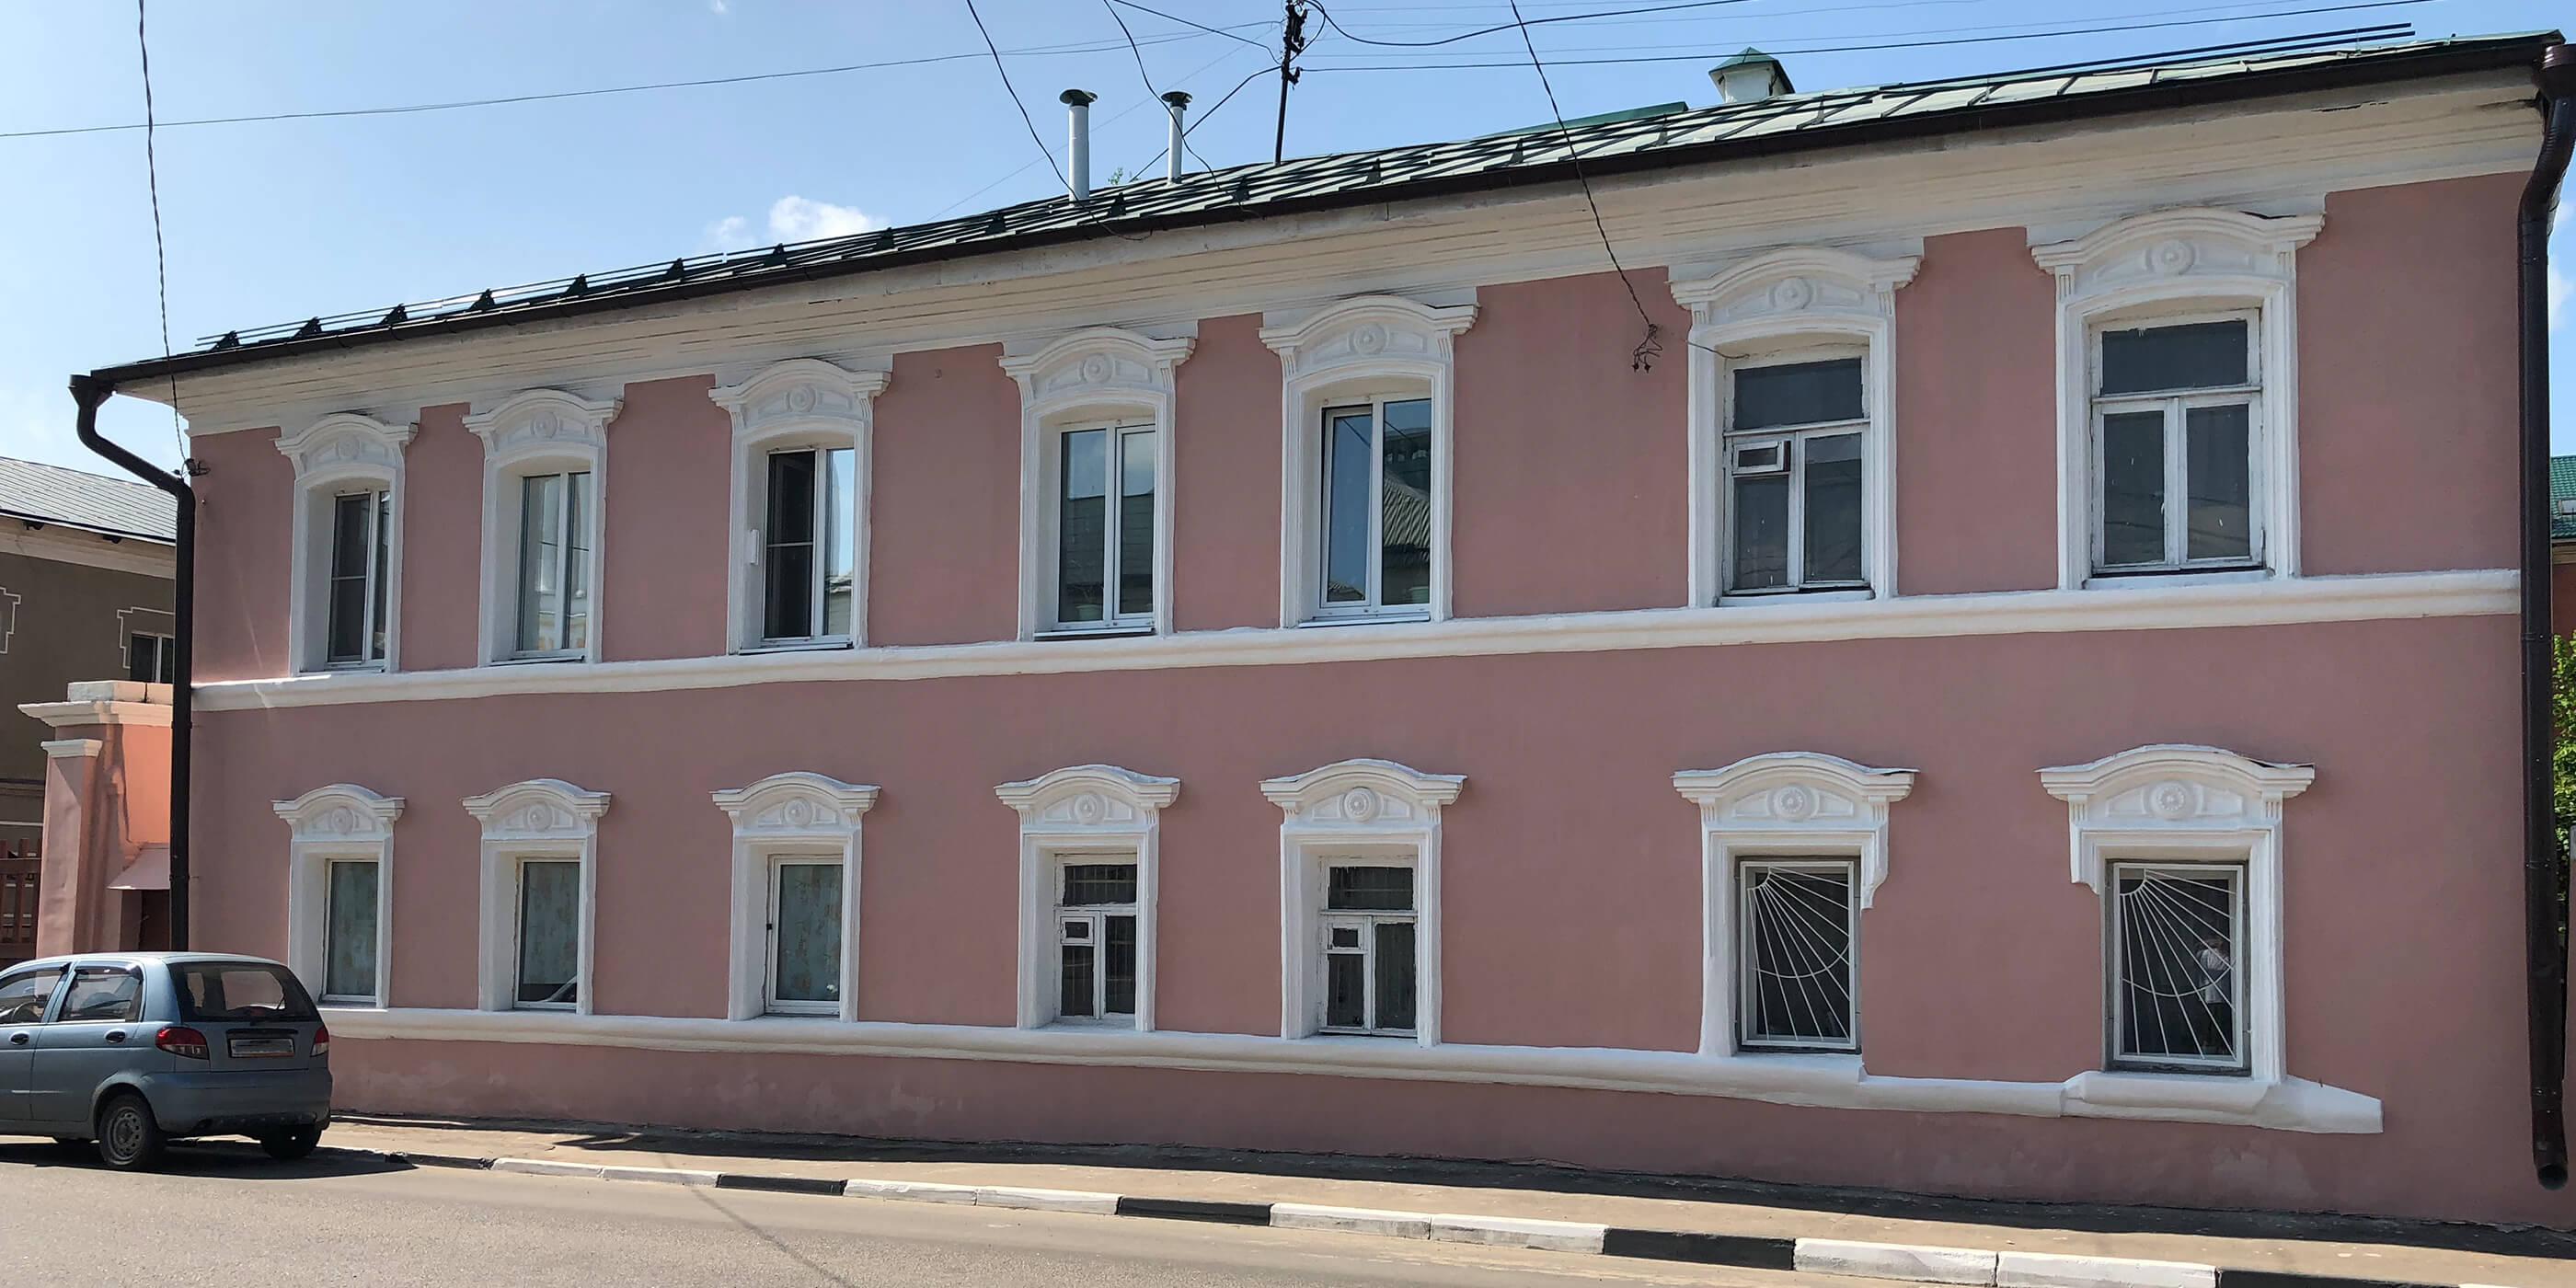 г.о. Коломна, ул. Красногвардейская, д. 13